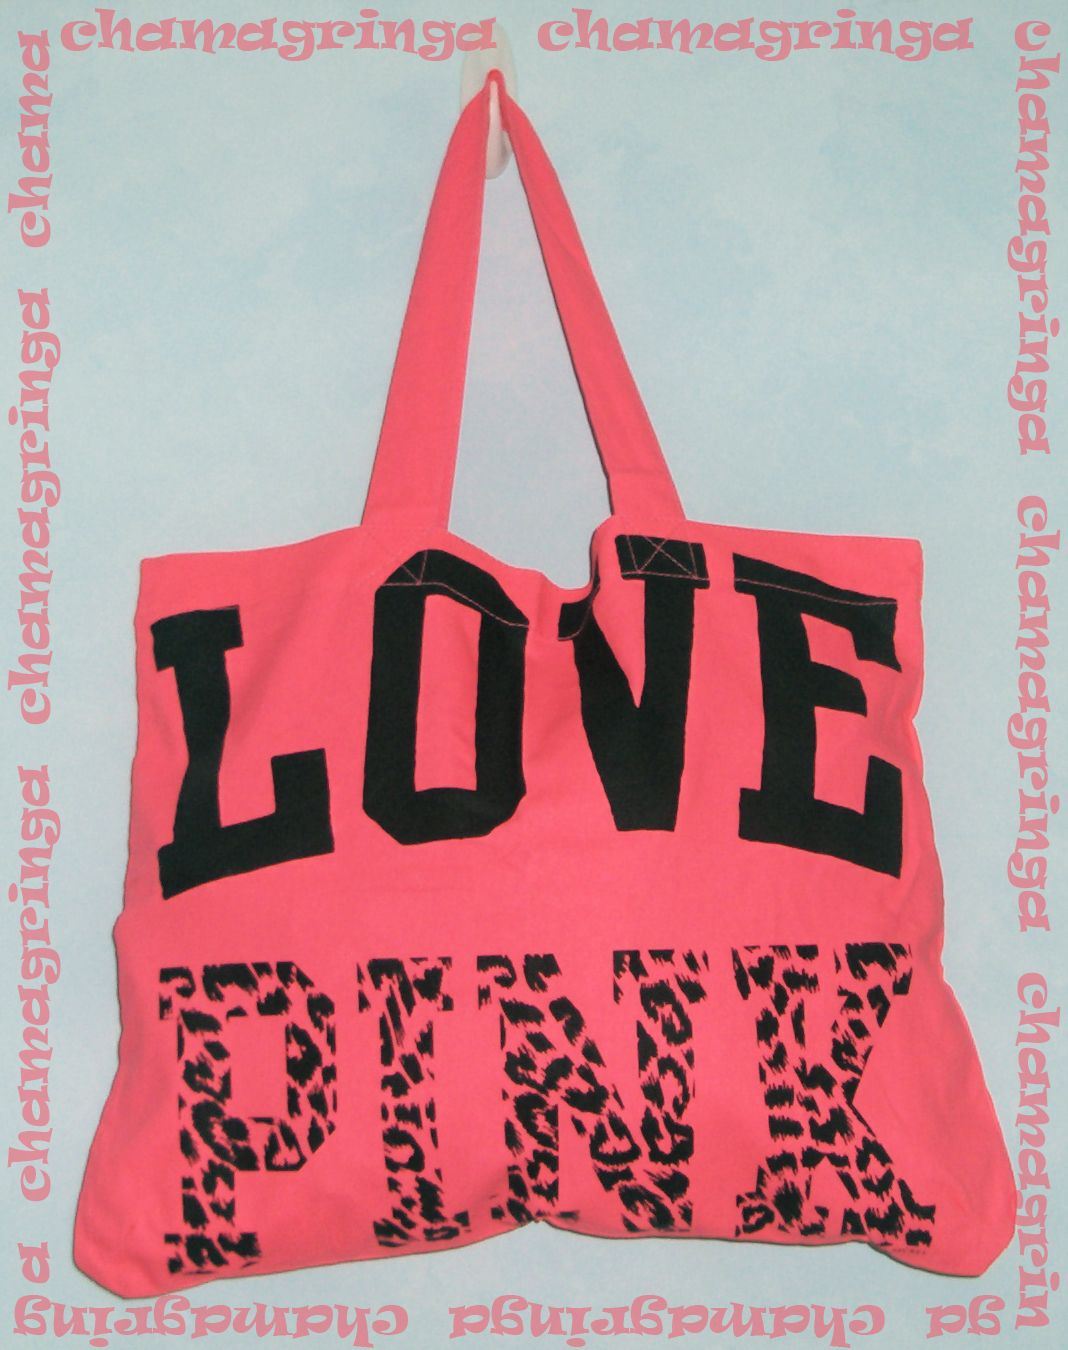 53dc7a65f5aa Victoria s Secret ♥ LOVE PINK ♥ neon pink TOTE   Book   Shopper   Beach  Gym  Bag